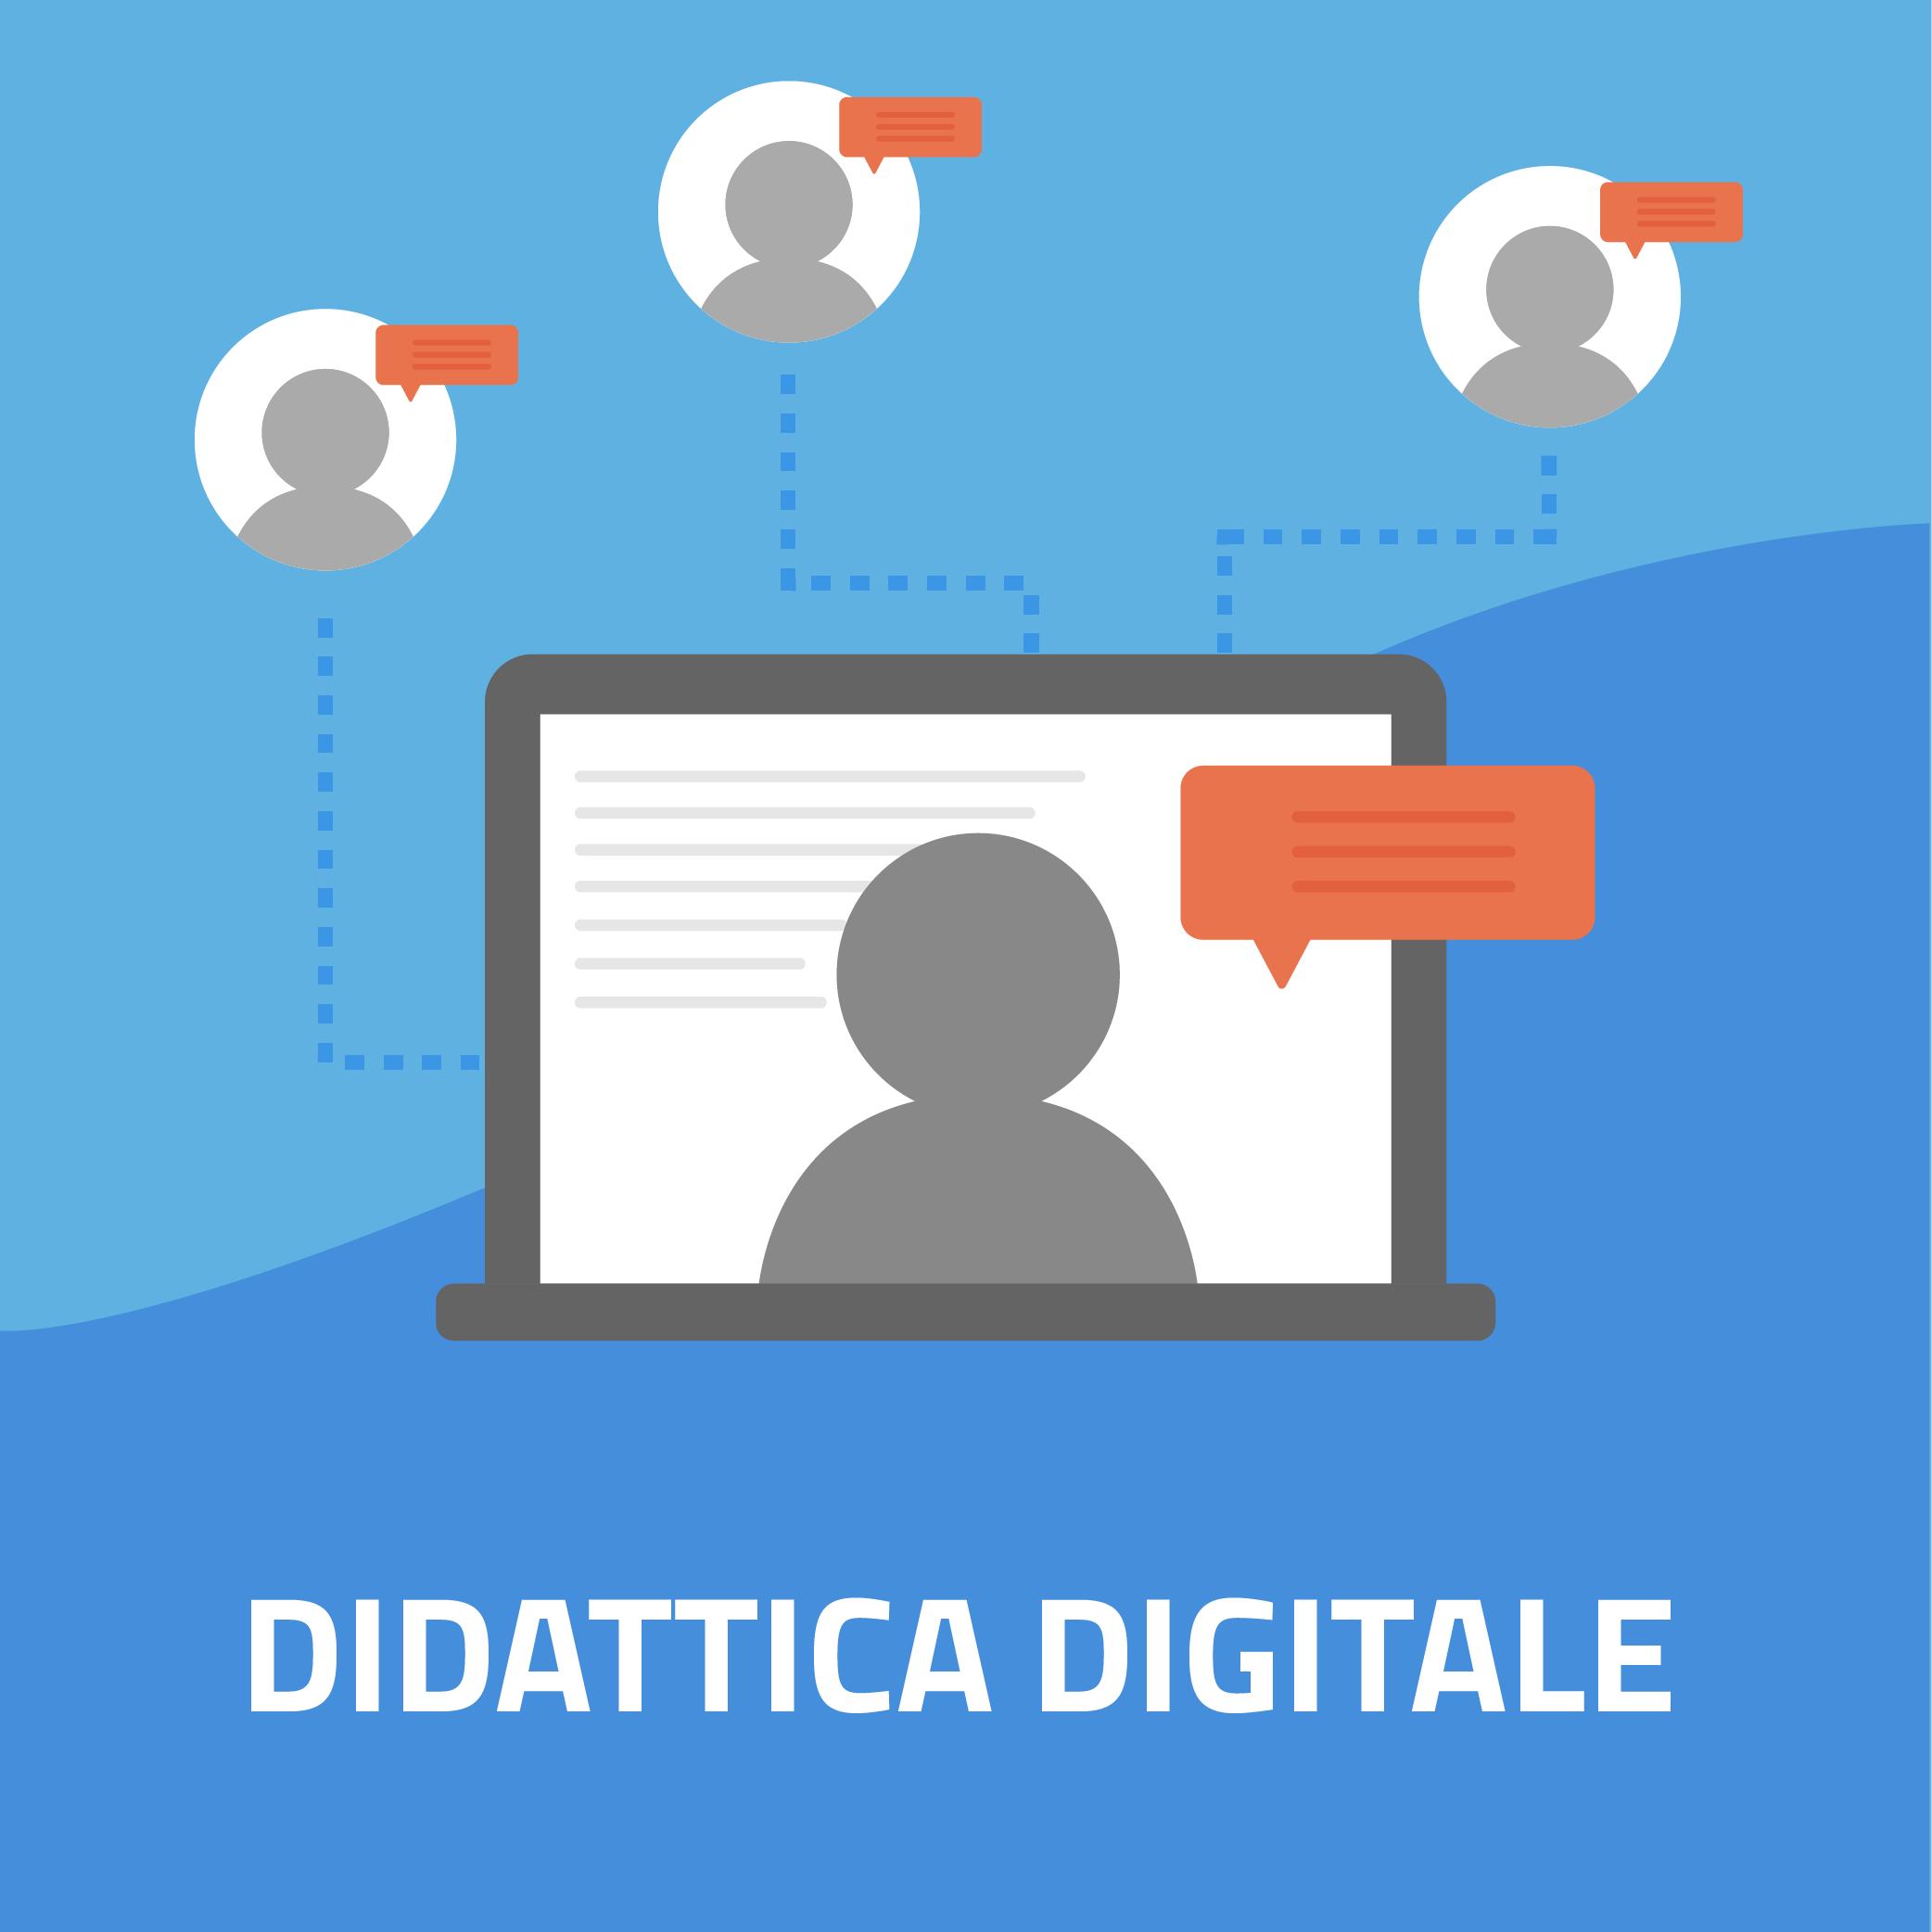 Didattica Digitale - Mondadori Education